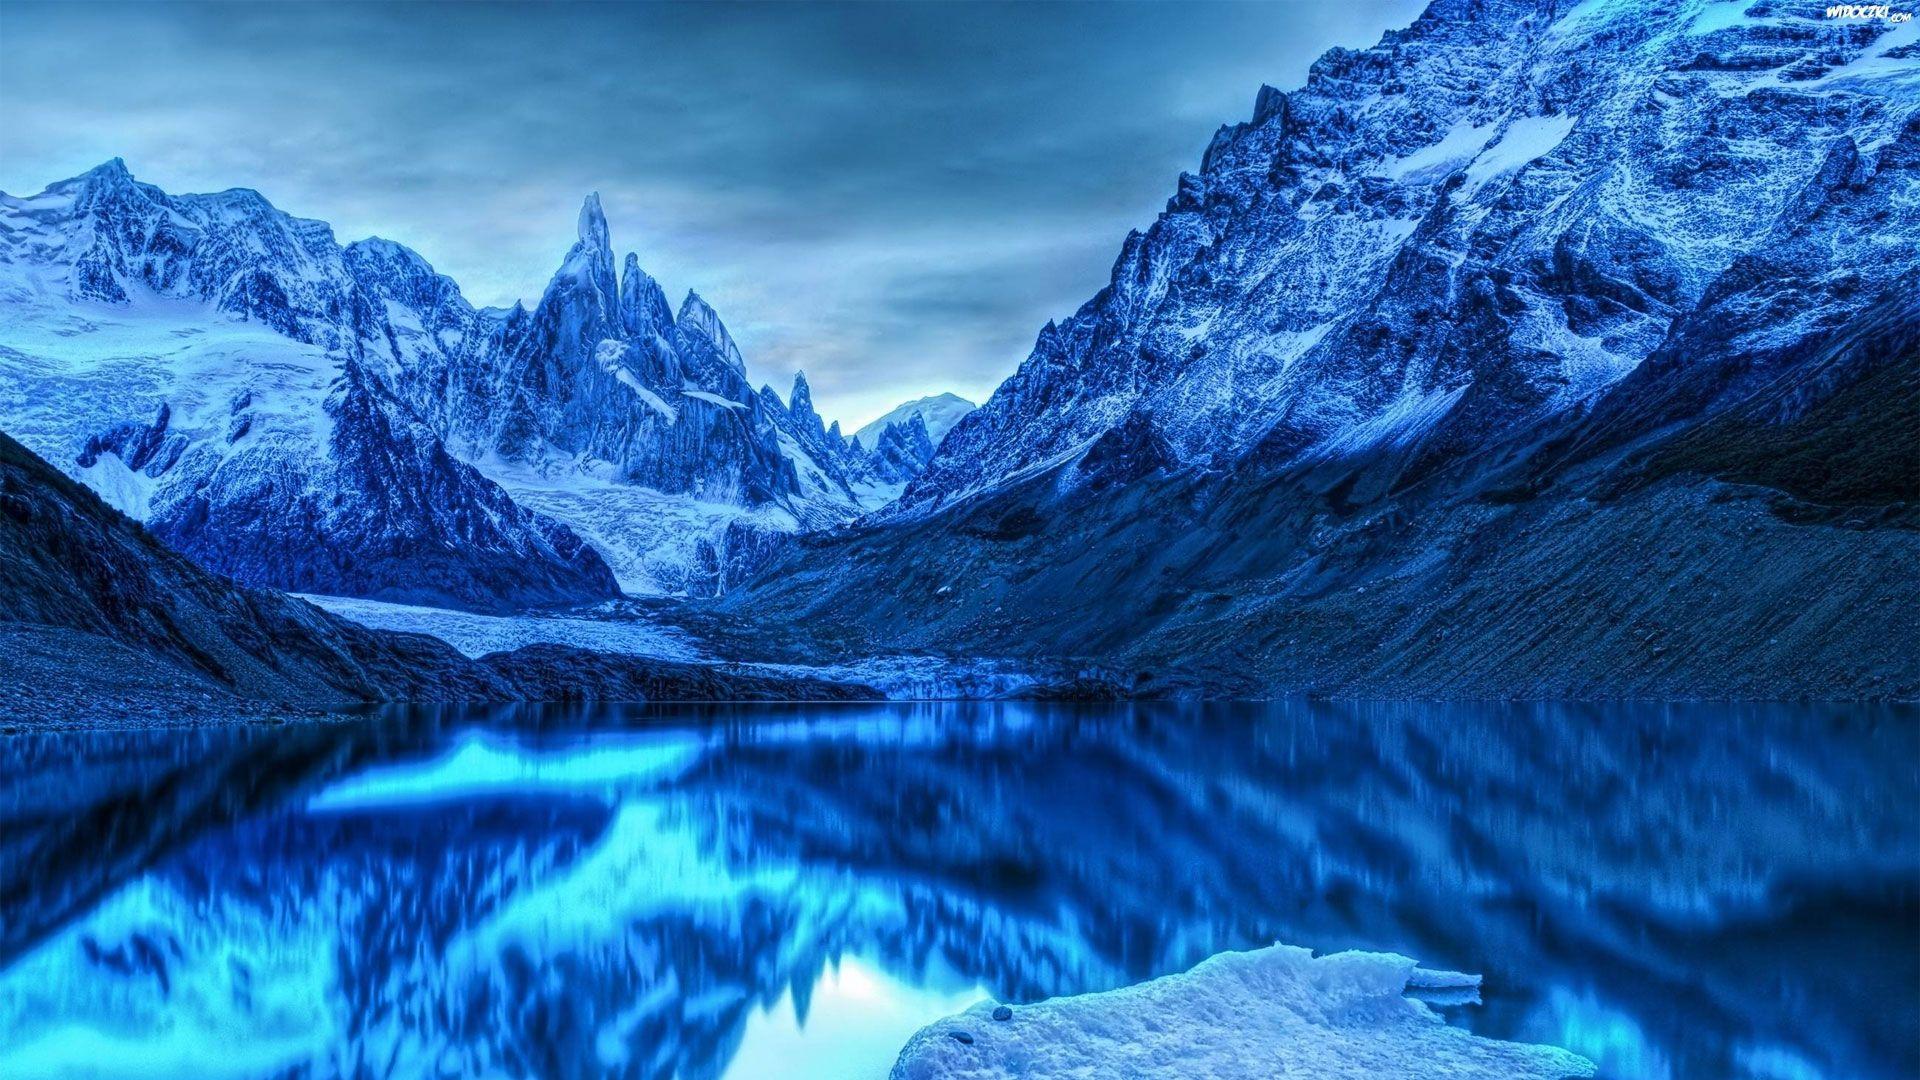 Cool Landscapes Chile Landscape Background